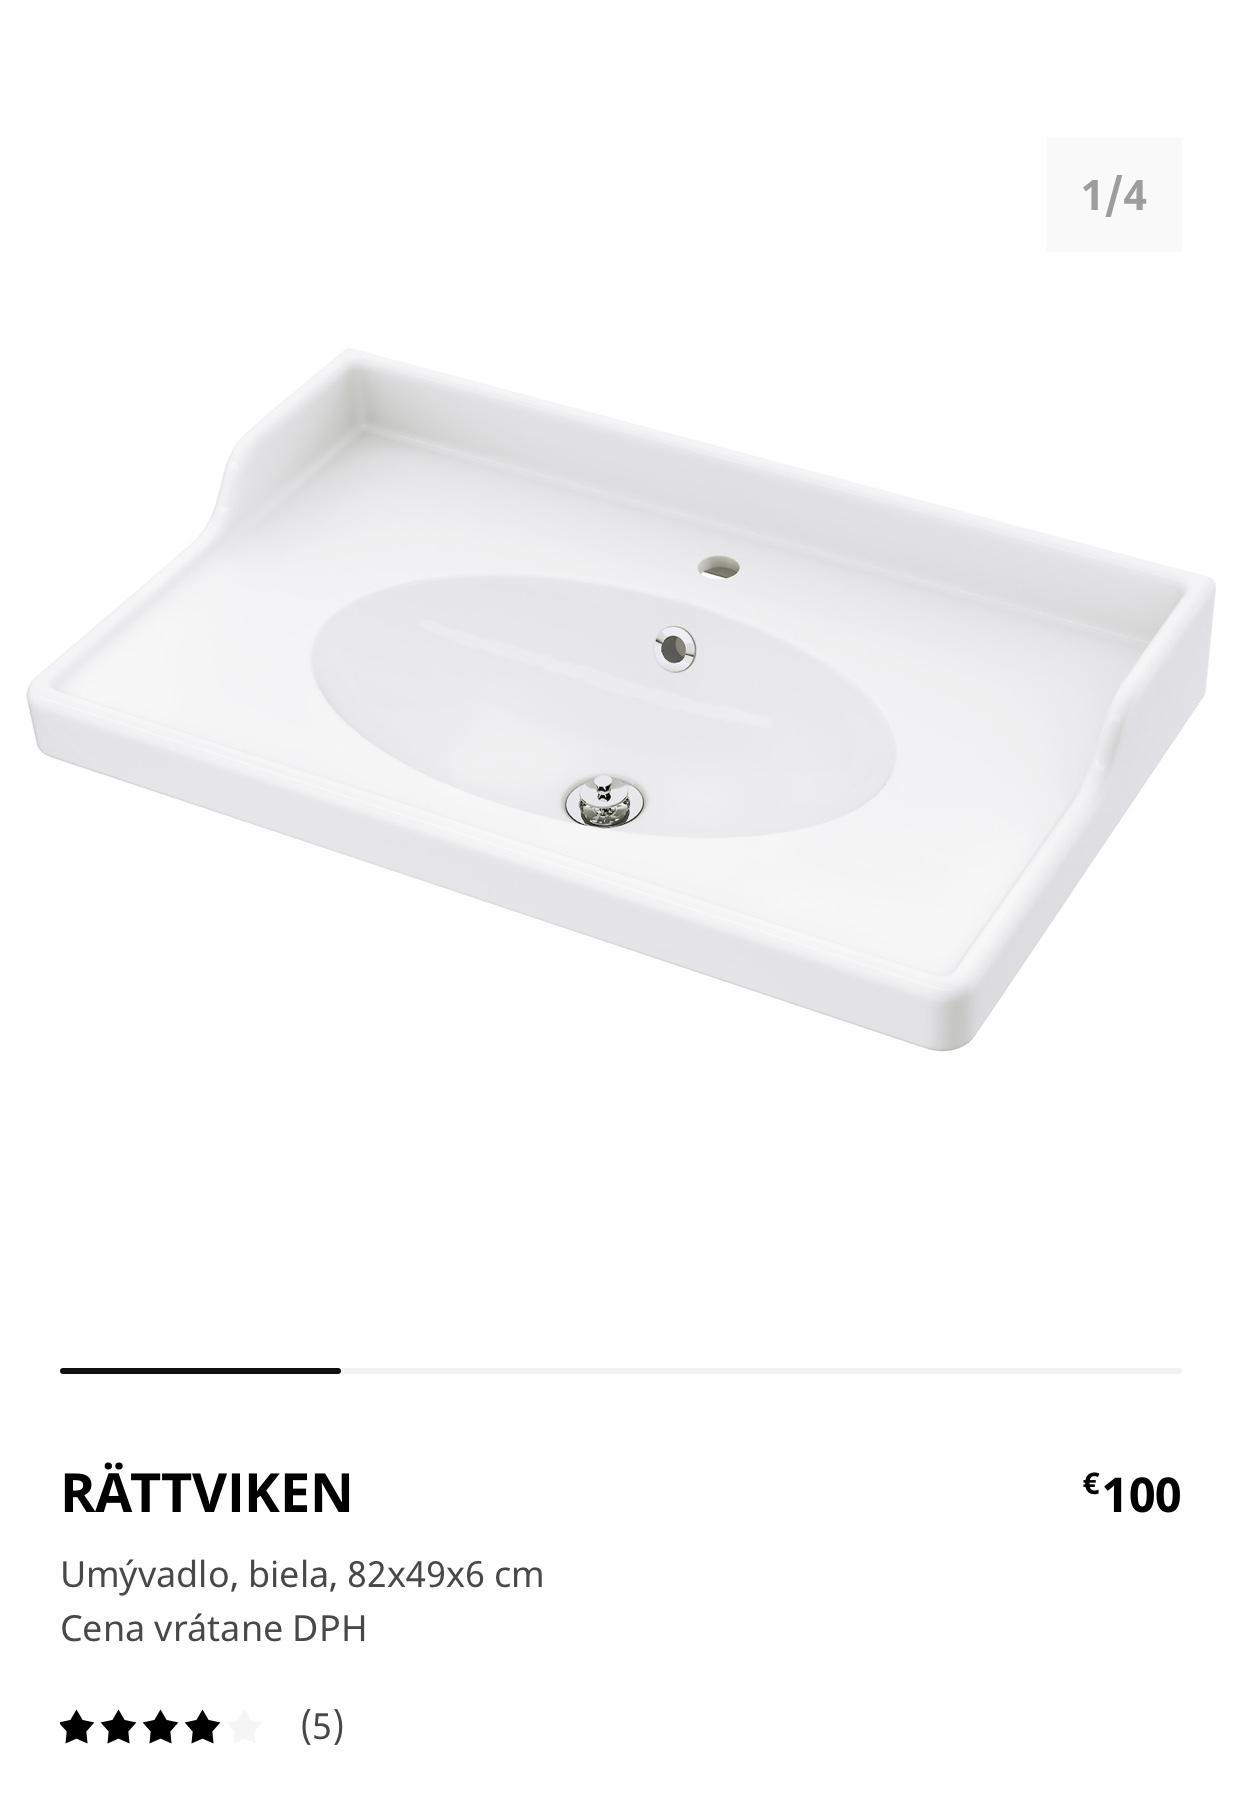 Nákupy do domčeka 🏡 - Ikea